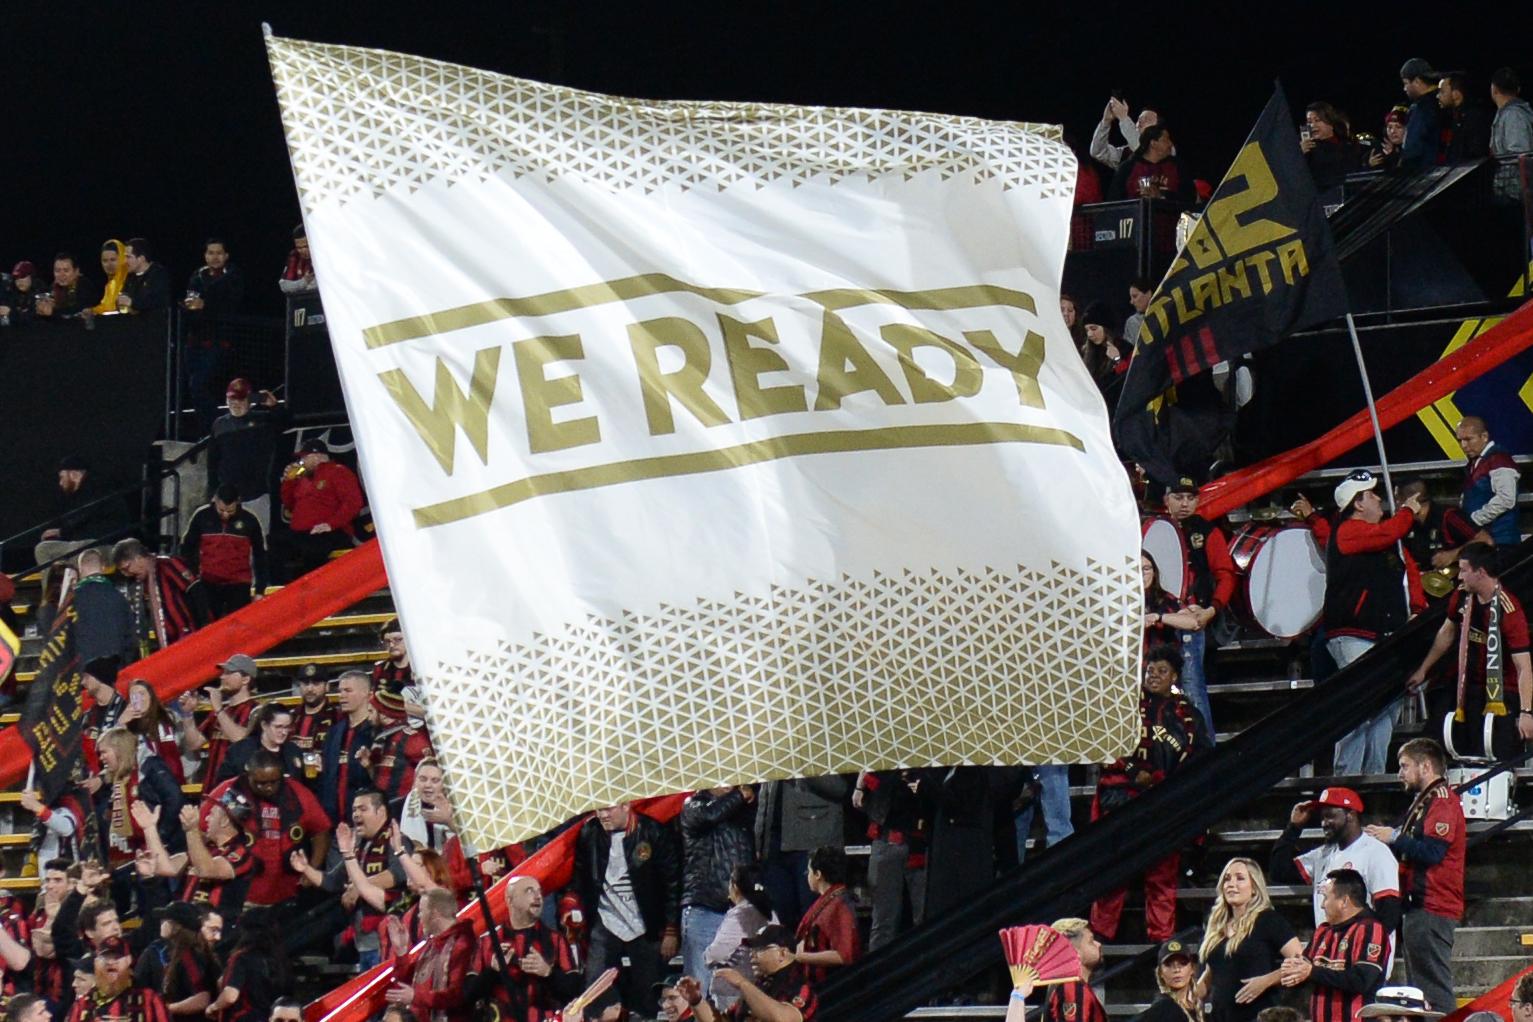 SOCCER: FEB 25 Concacaf Champions League - Motagua at Atlanta United